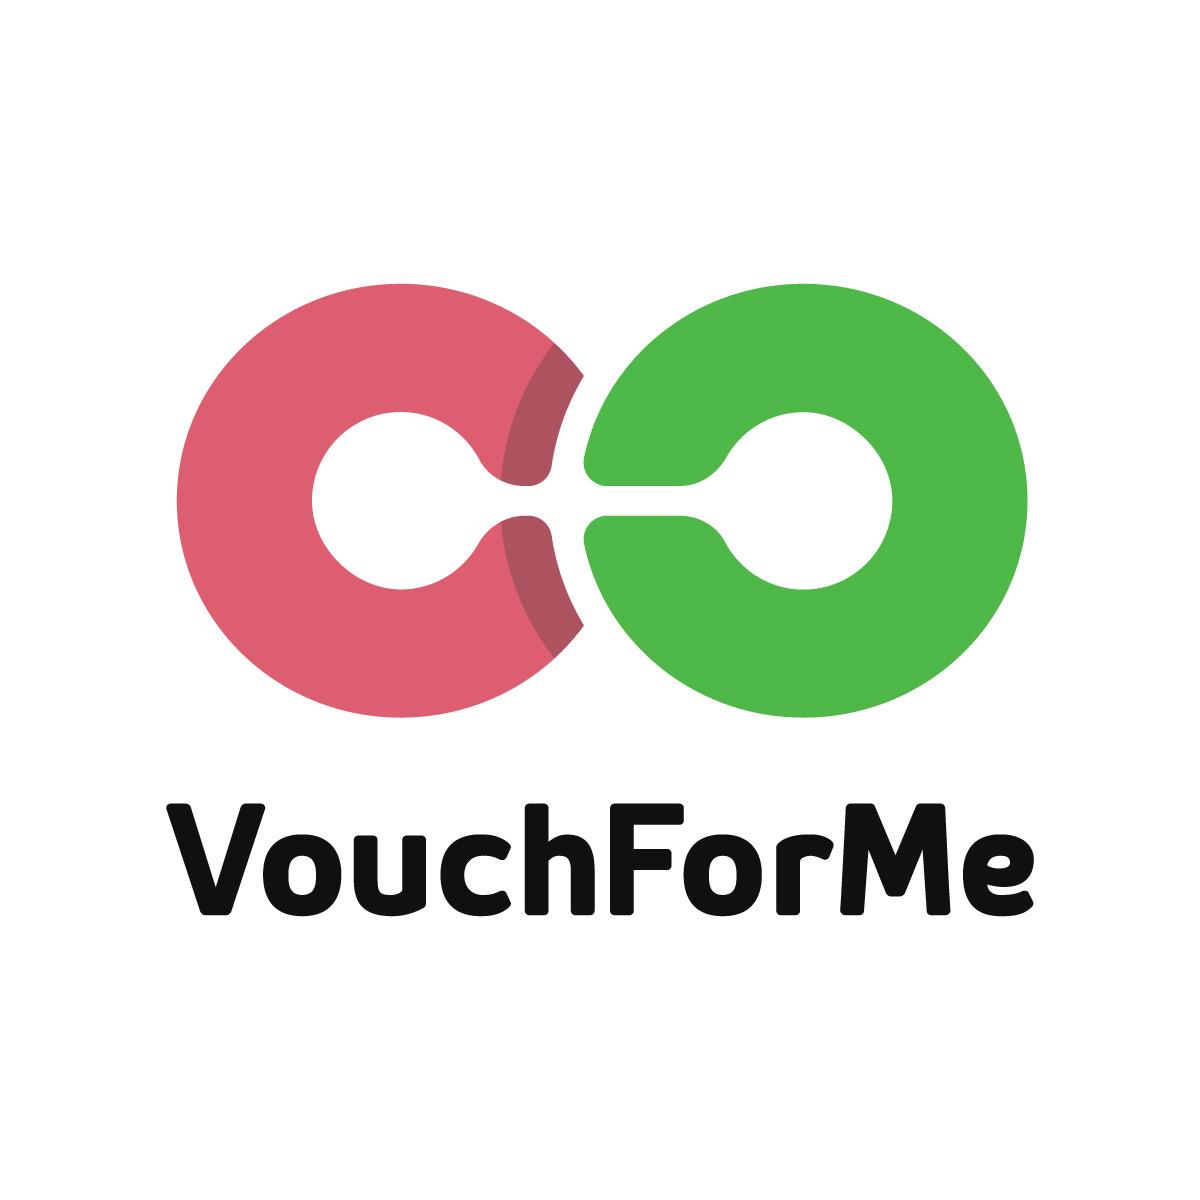 VouchForMe